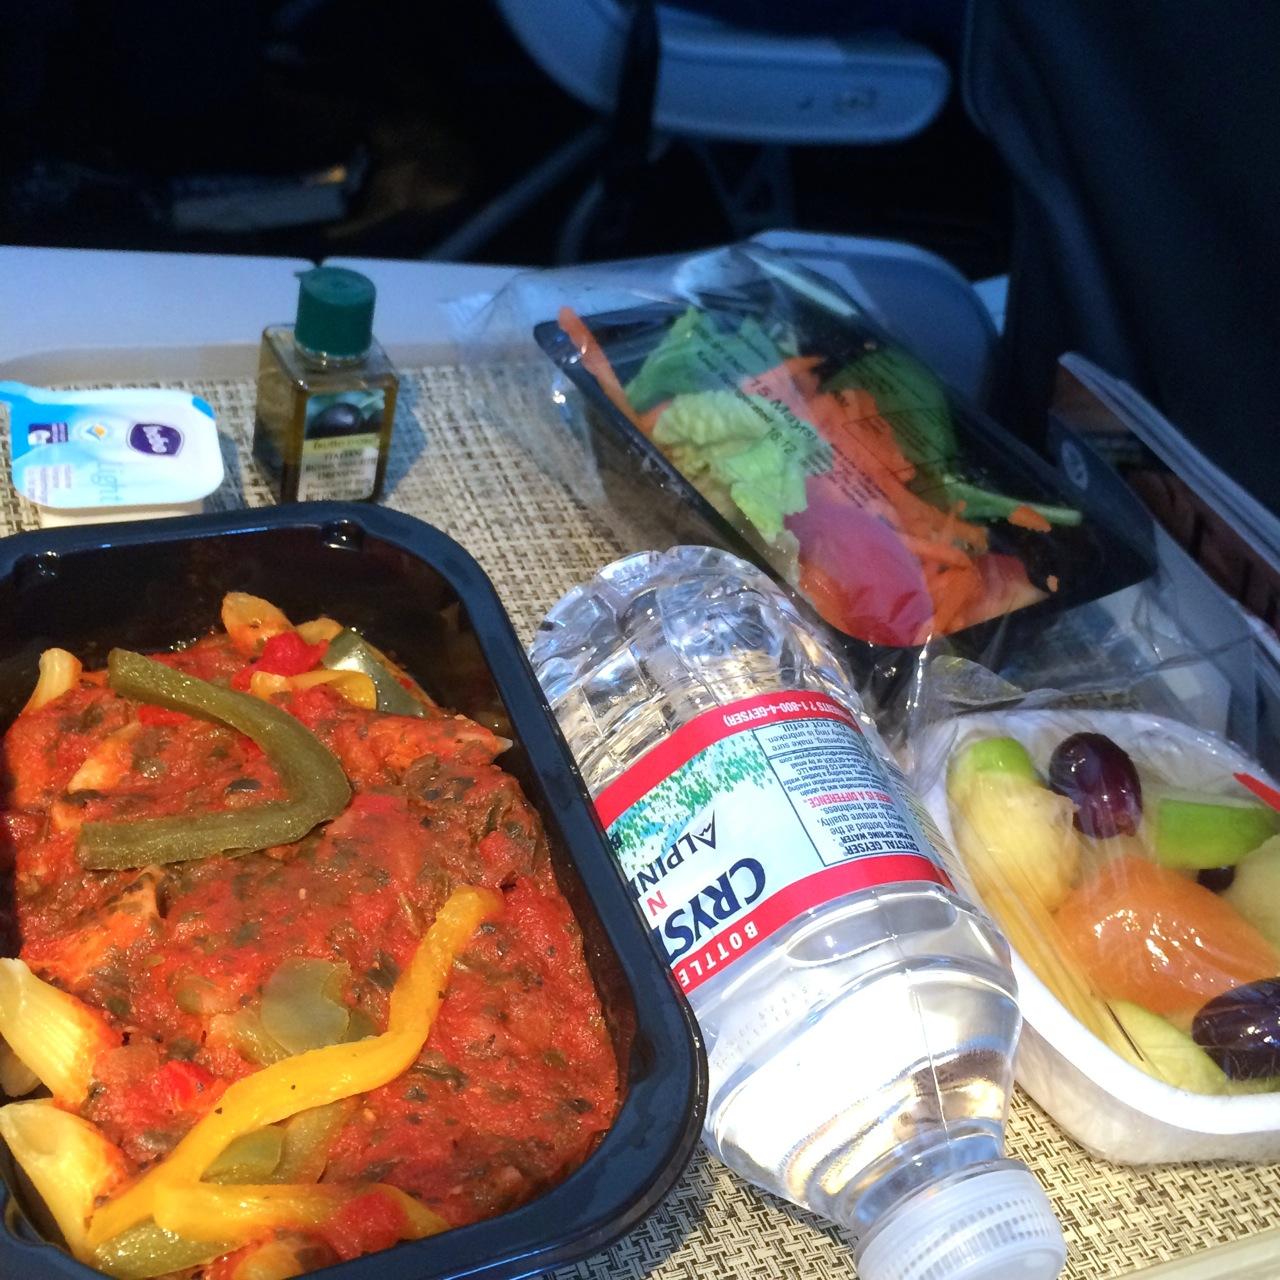 http://i1.wp.com/fatgayvegan.com/wp-content/uploads/2015/05/vegan-meal-American-Airlines.jpg?fit=1280%2C1280